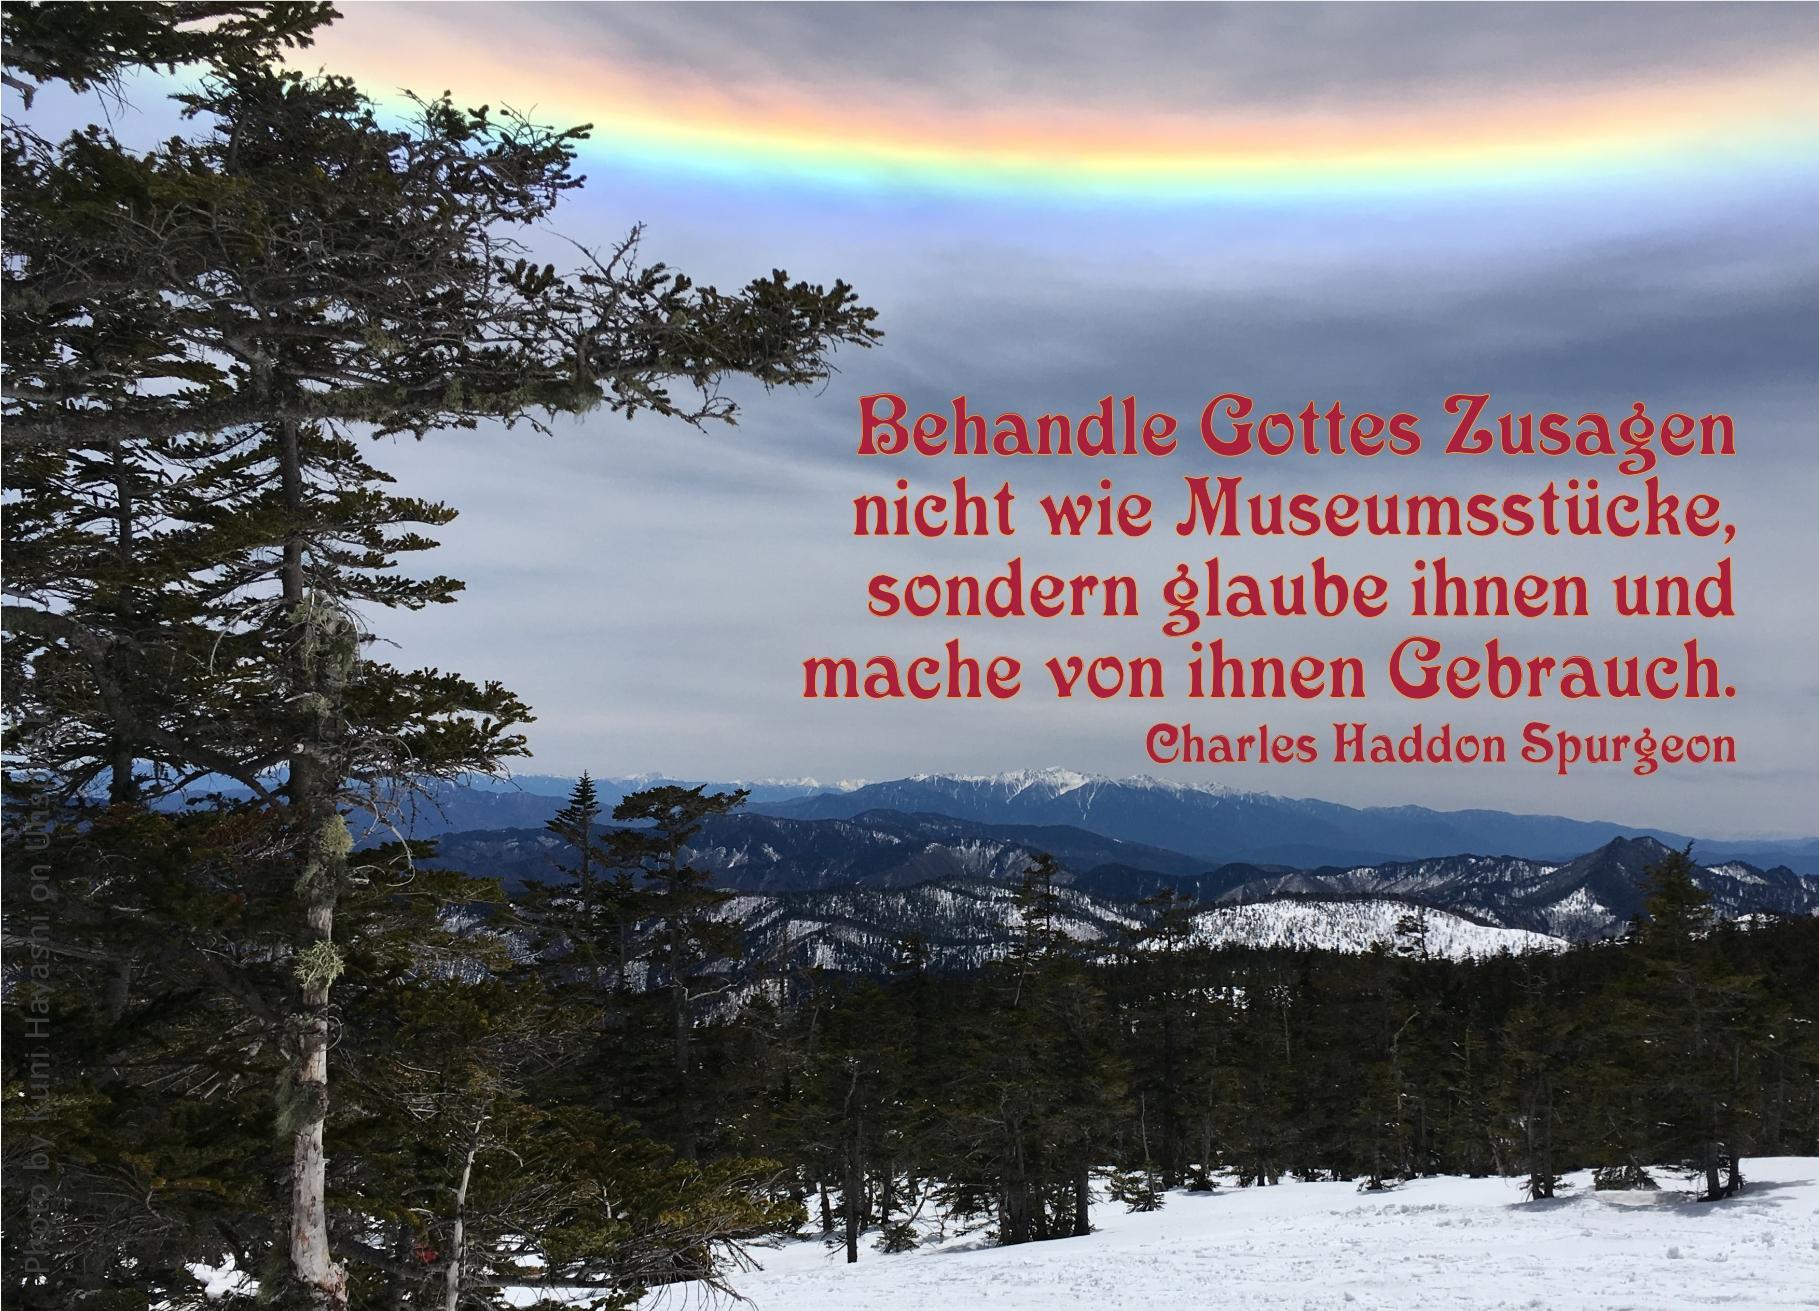 "alt=""regenbogen_ueber_bergpanorama_erwartet_bibelhoerbuch_jesus_kommt_bald"""